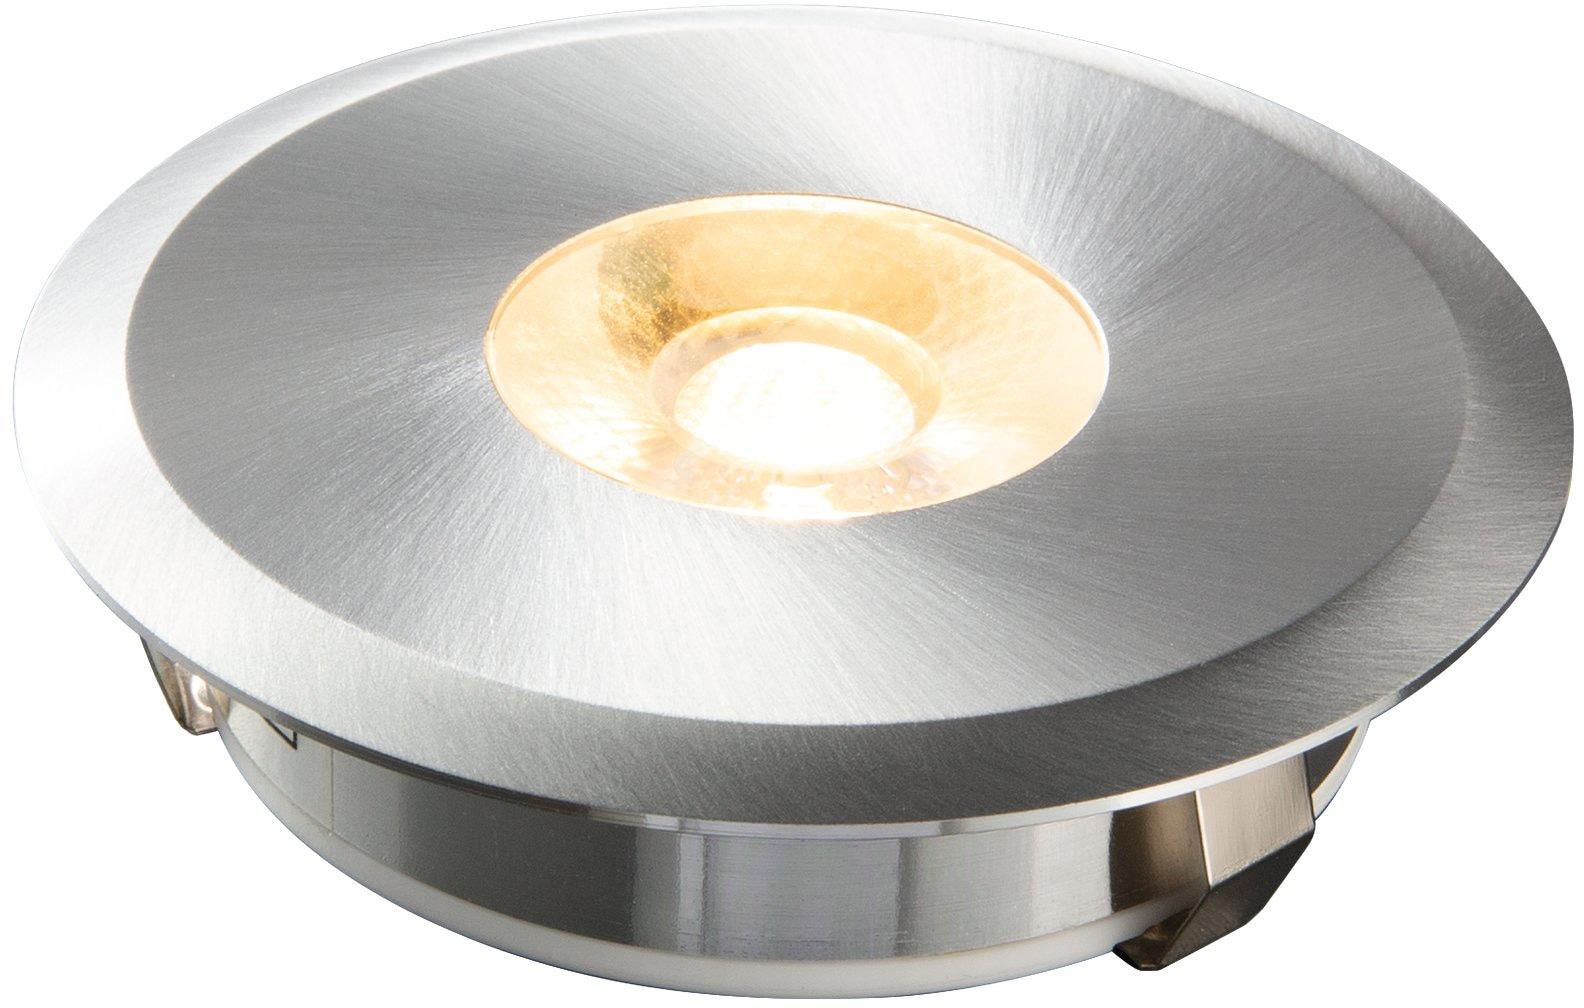 HEITRONIC LED Einbaustrahler Austin, LED-Modul, 1 St., Warmweiß, Gehäuse aus massivem Aluminium (CNC gefräst)